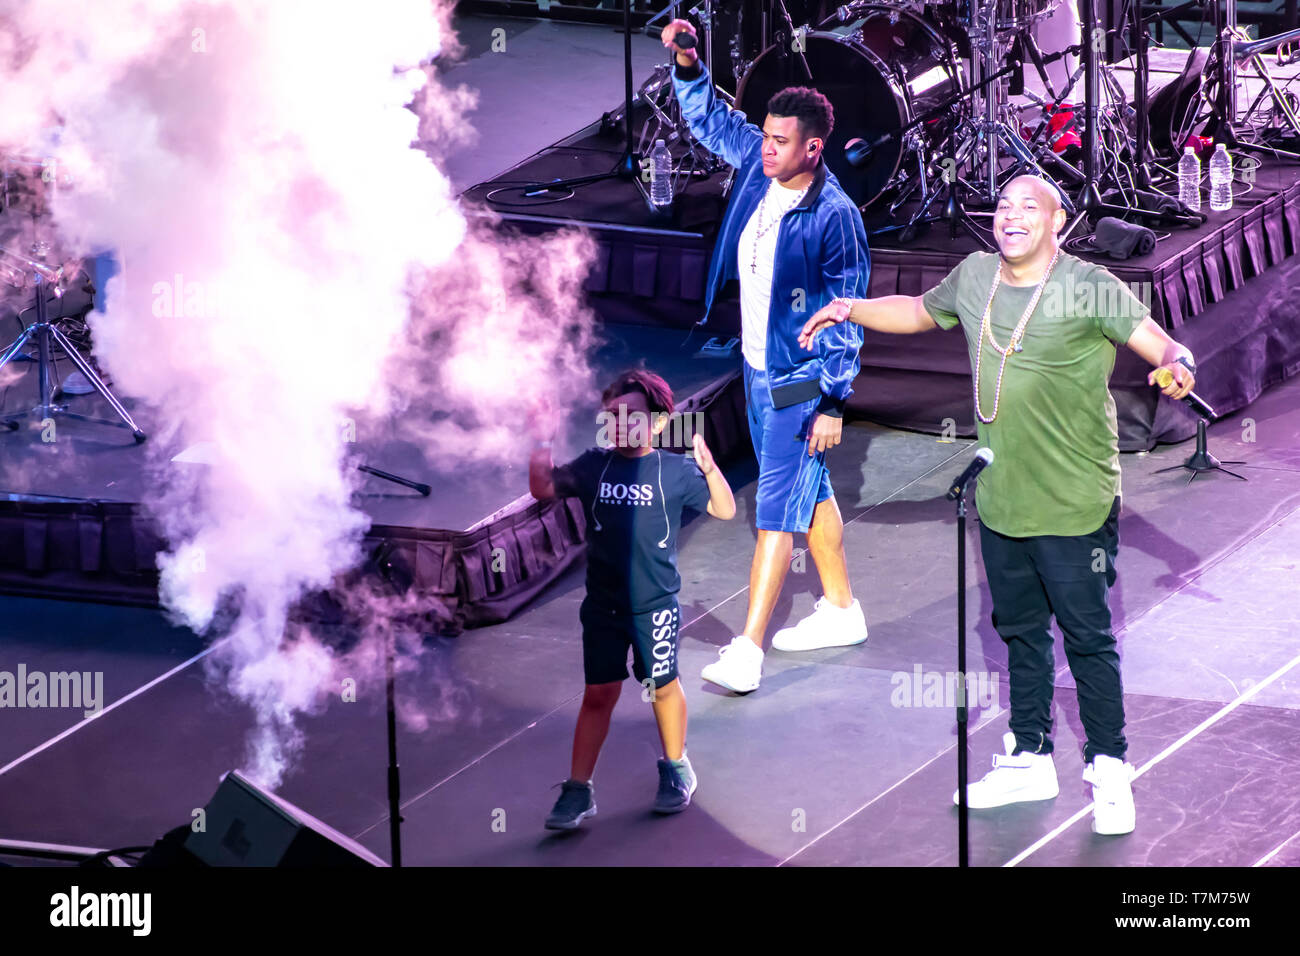 Orlando, Florida. March 17, 2019. Randy Malcom and Alexander Delgado by Gente de Zona singing urban music at Seaworld  in International Drive Area  (3 Stock Photo